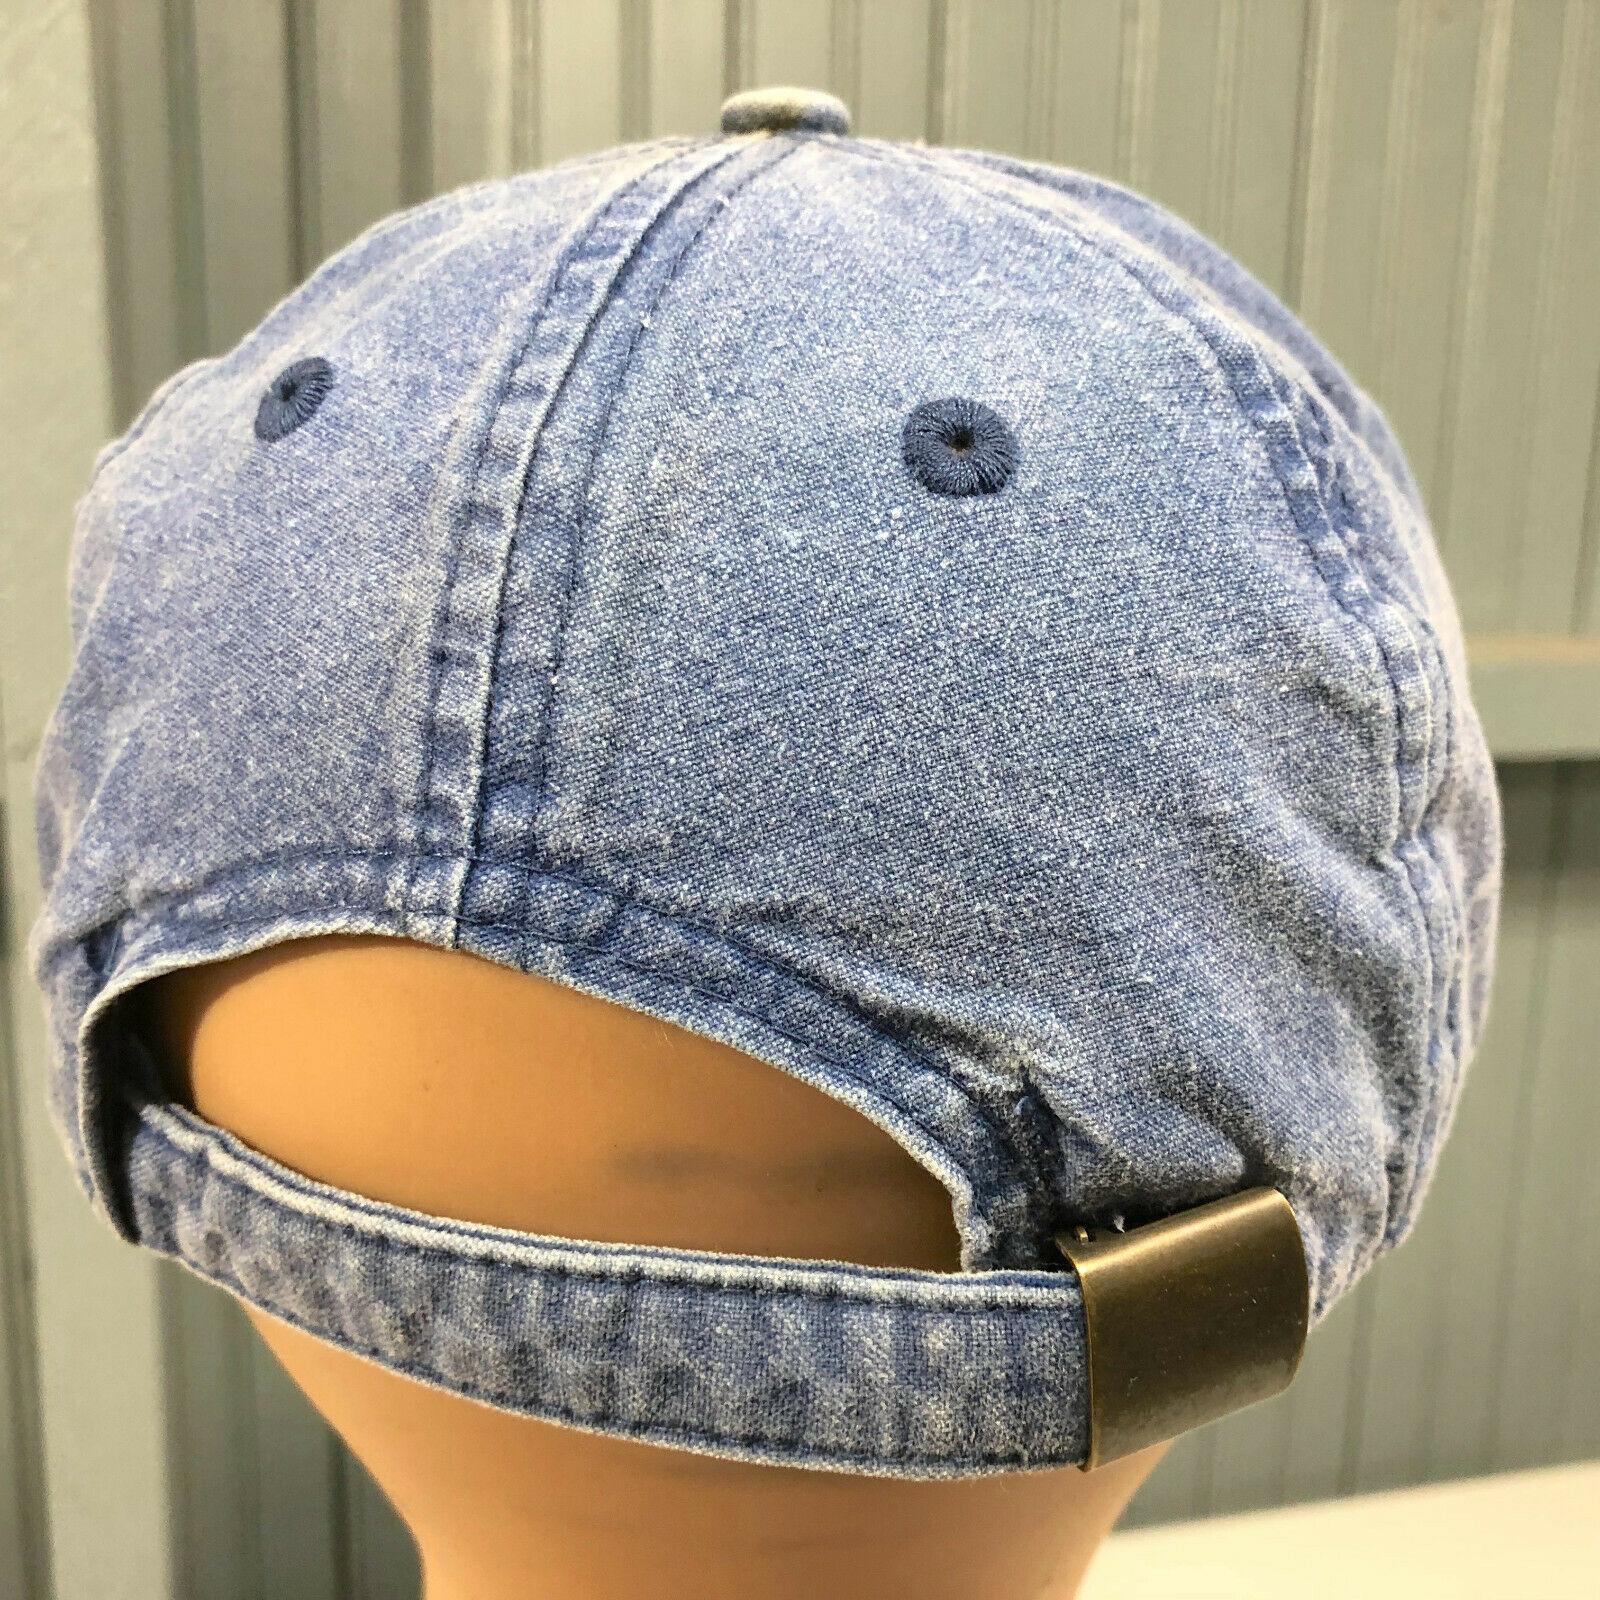 Columbia Sportswear Denim Strapback Retro Distressed Baseball Cap Hat